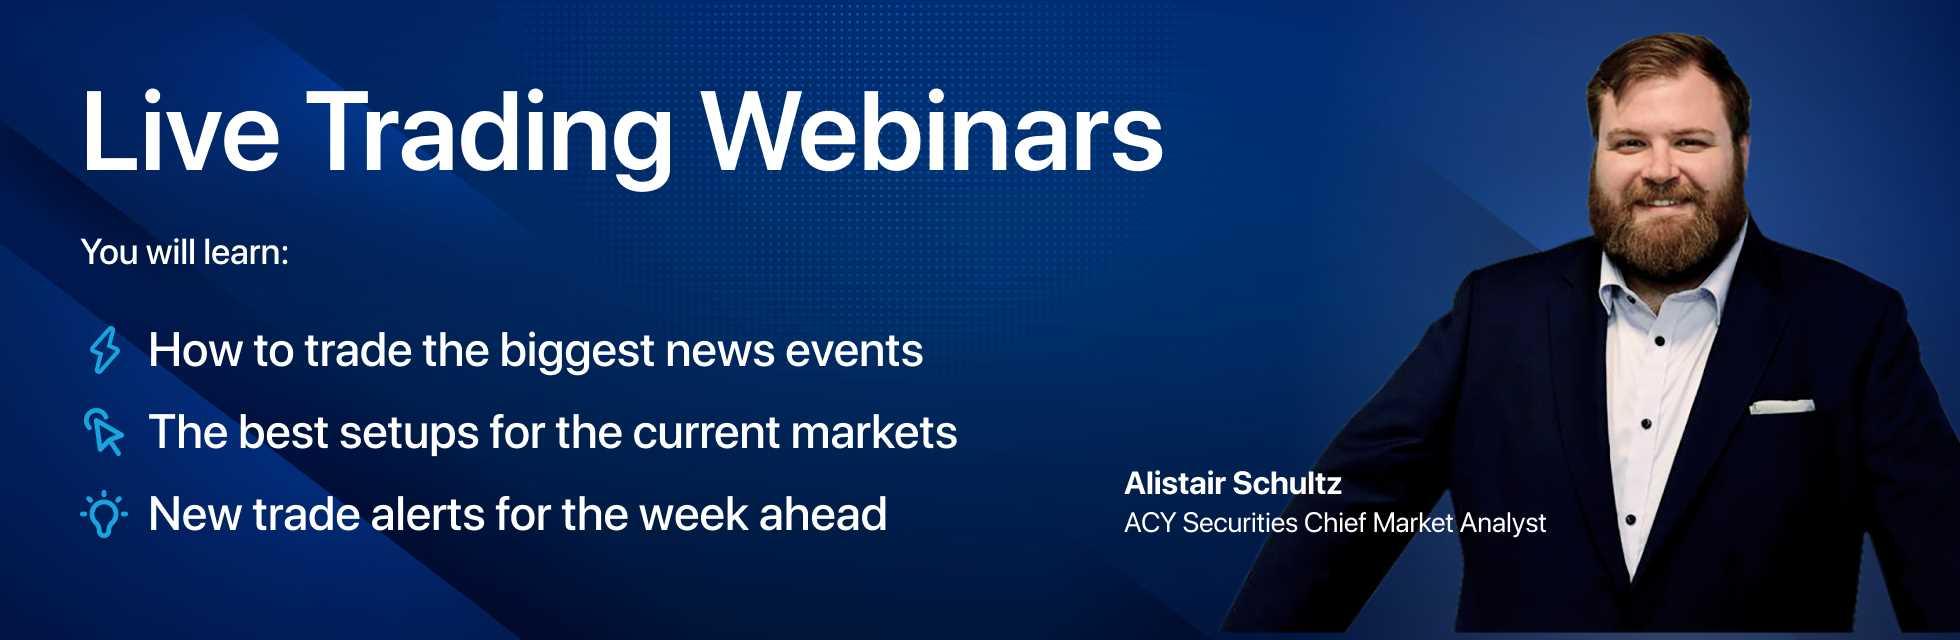 ACY Securities Webinars